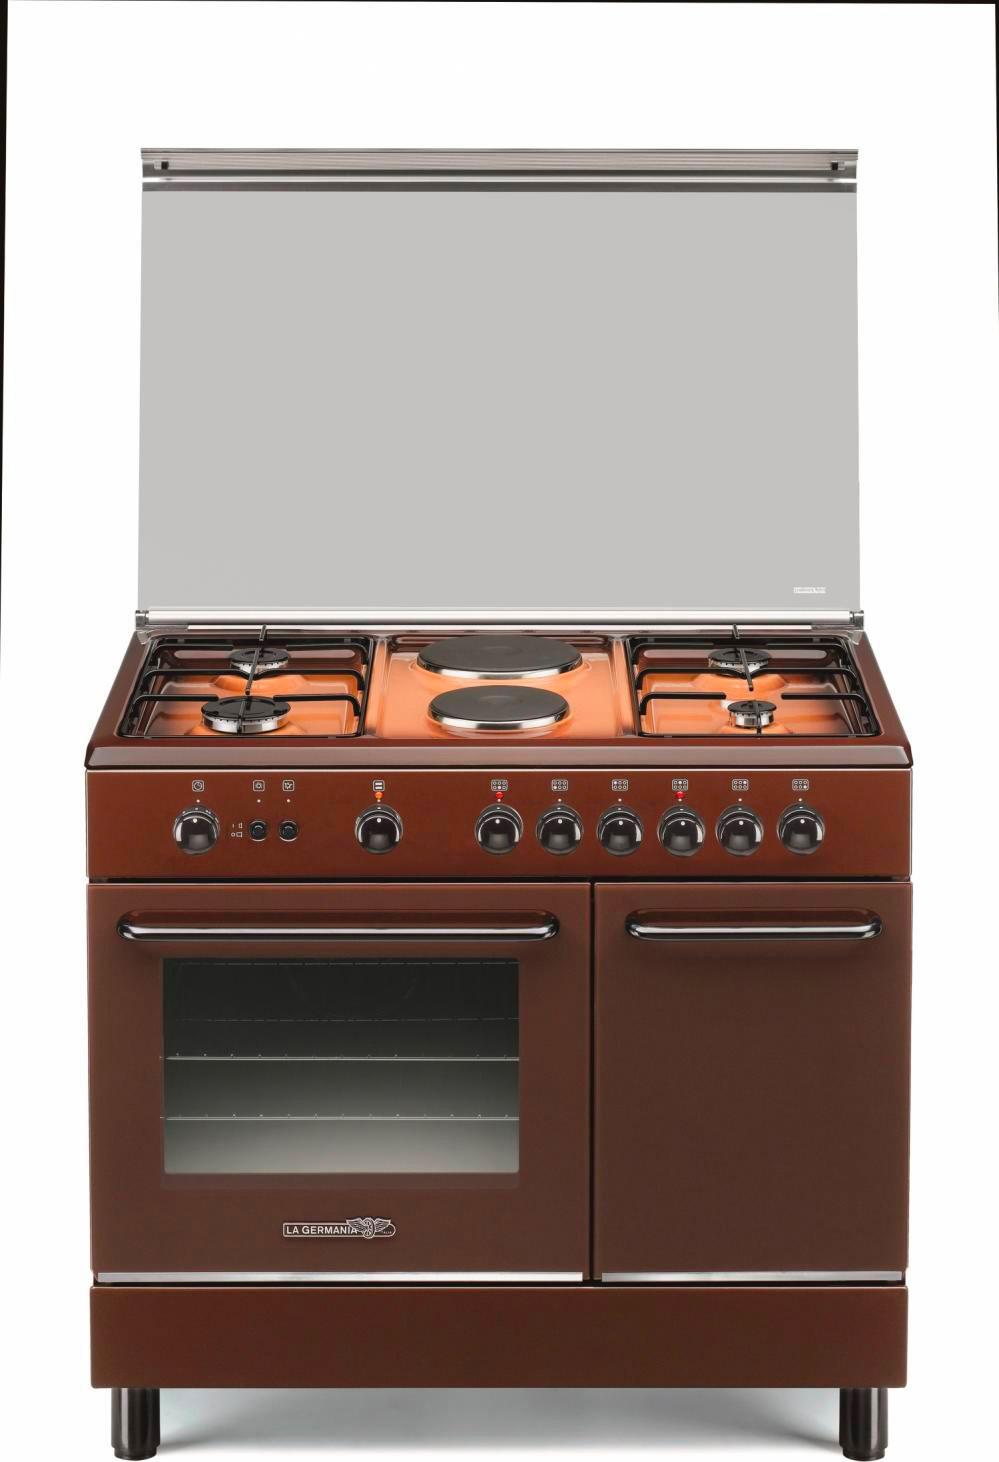 Cucina A Gas 6 Fuochi La Germania Forno Elettrico 90x60 Cm Marrone Sp9 42 41 C Ebay